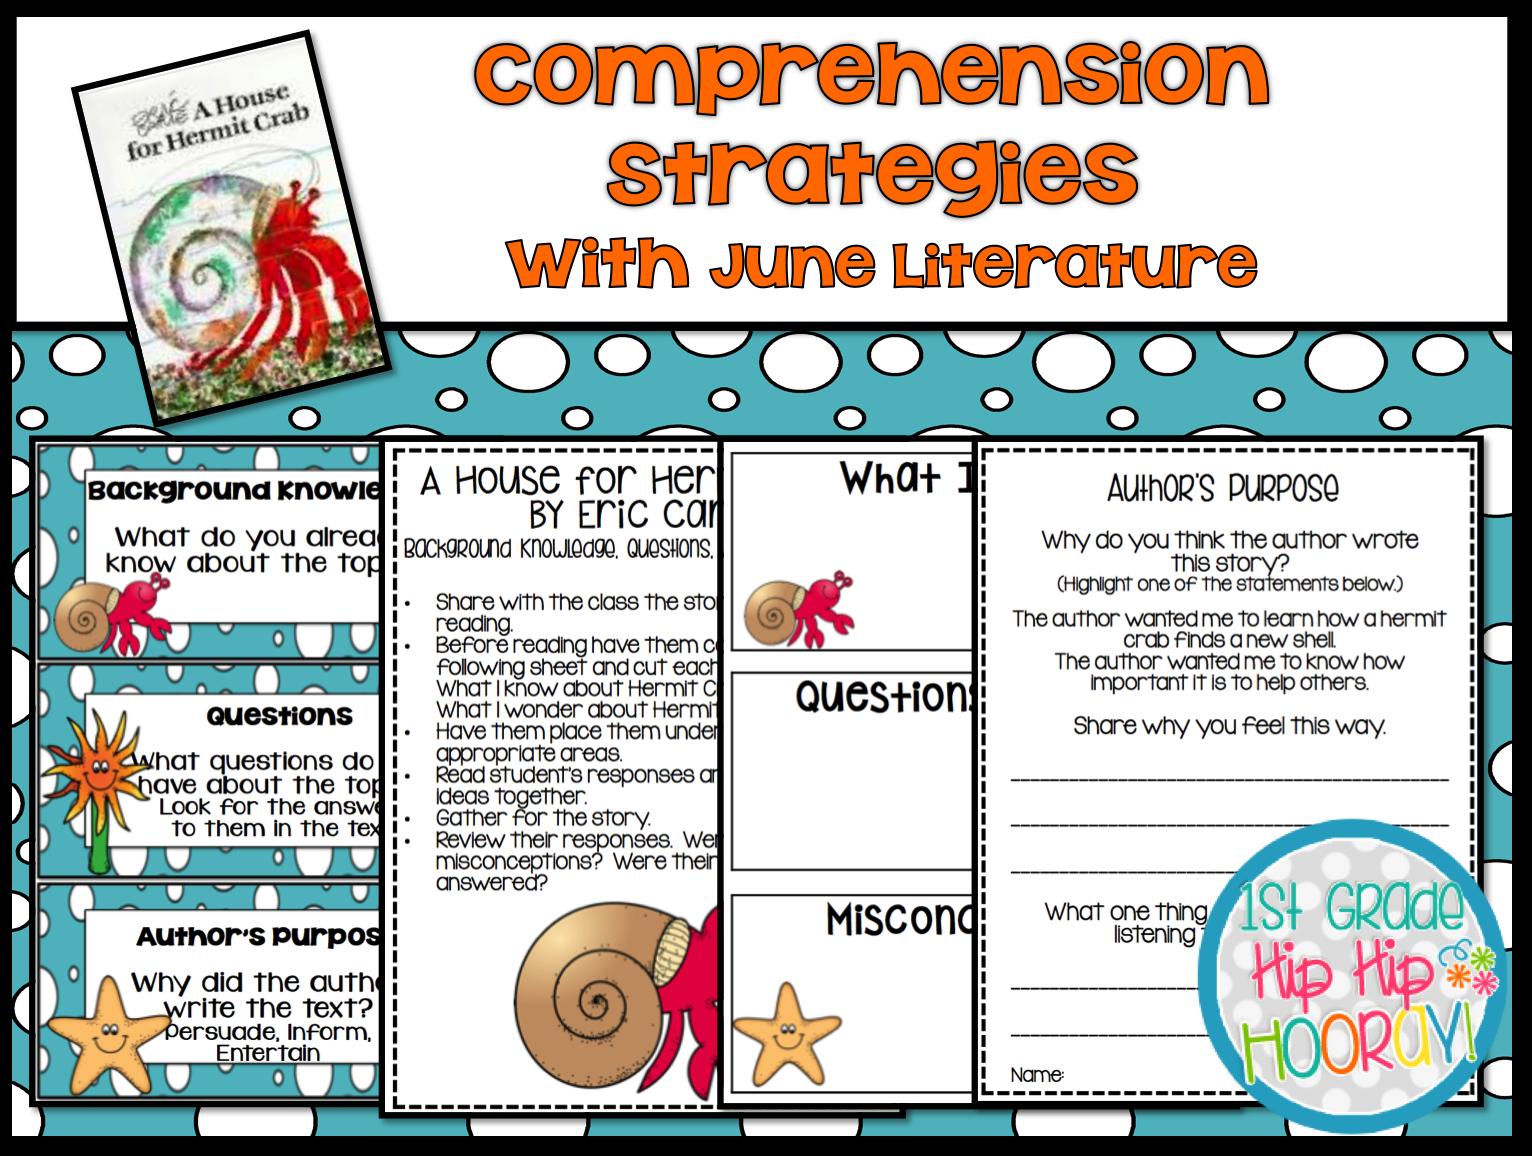 1st Grade Hip Hip Hooray Teaching Comprehension